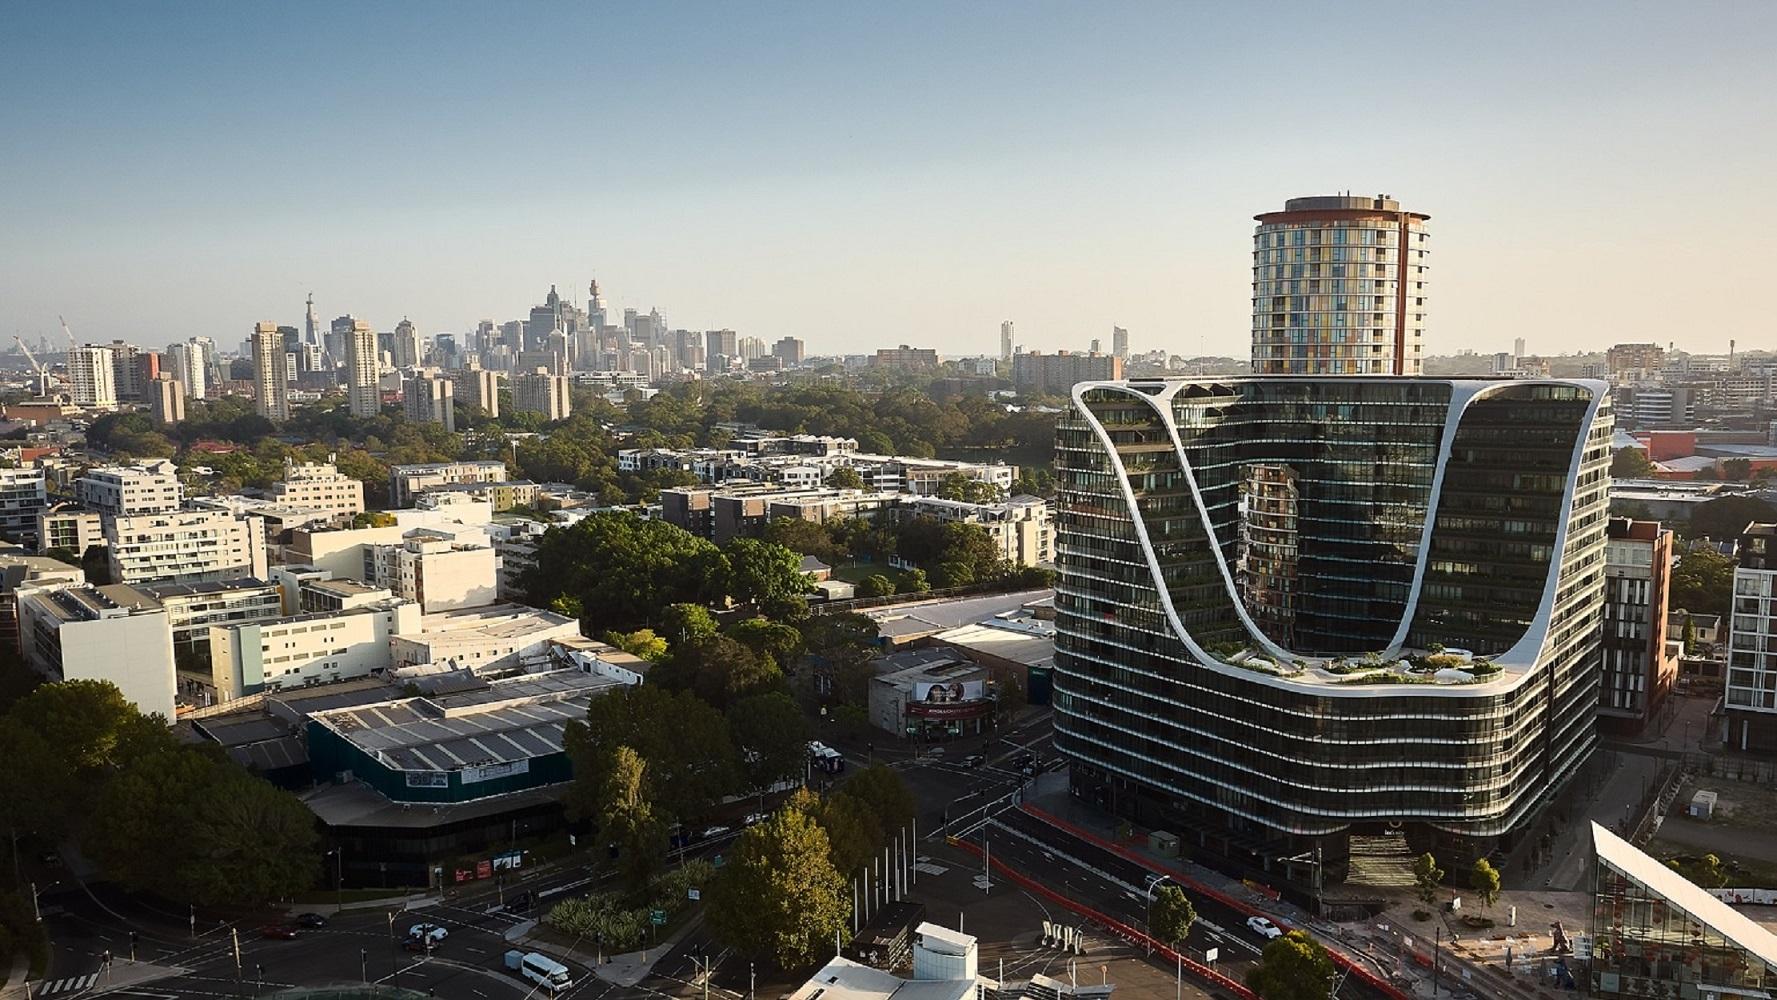 Skye Suites Green Square hotel mewah dalam bangunan ikonik kota Sydney arsitektur interior design architecture